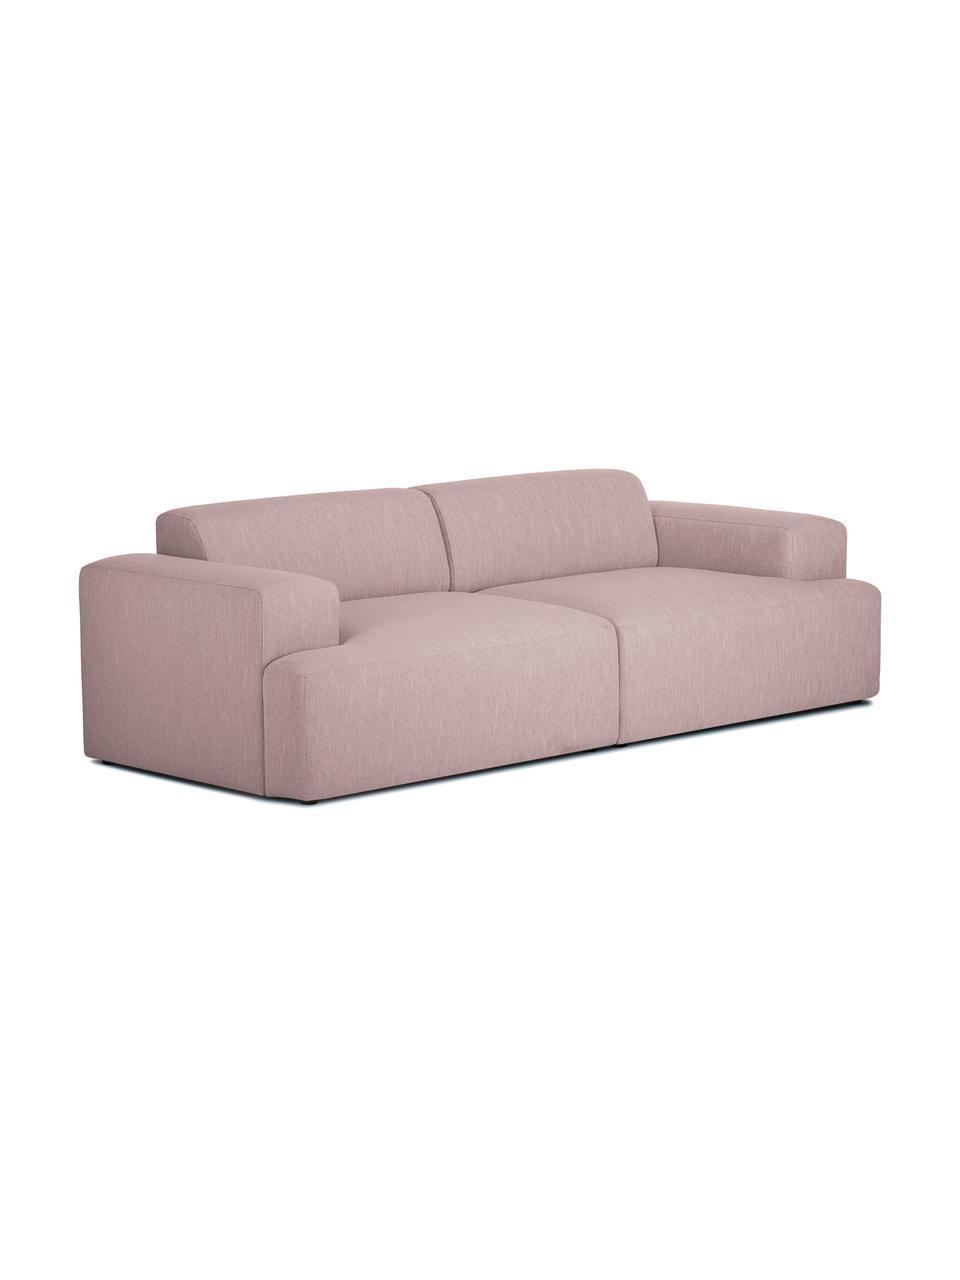 Bank Melva (3-zits) in roze, Bekleding: polyester, Frame: massief grenenhout, spaan, Poten: grenenhout, Geweven stof roze, B 240 x D 101 cm